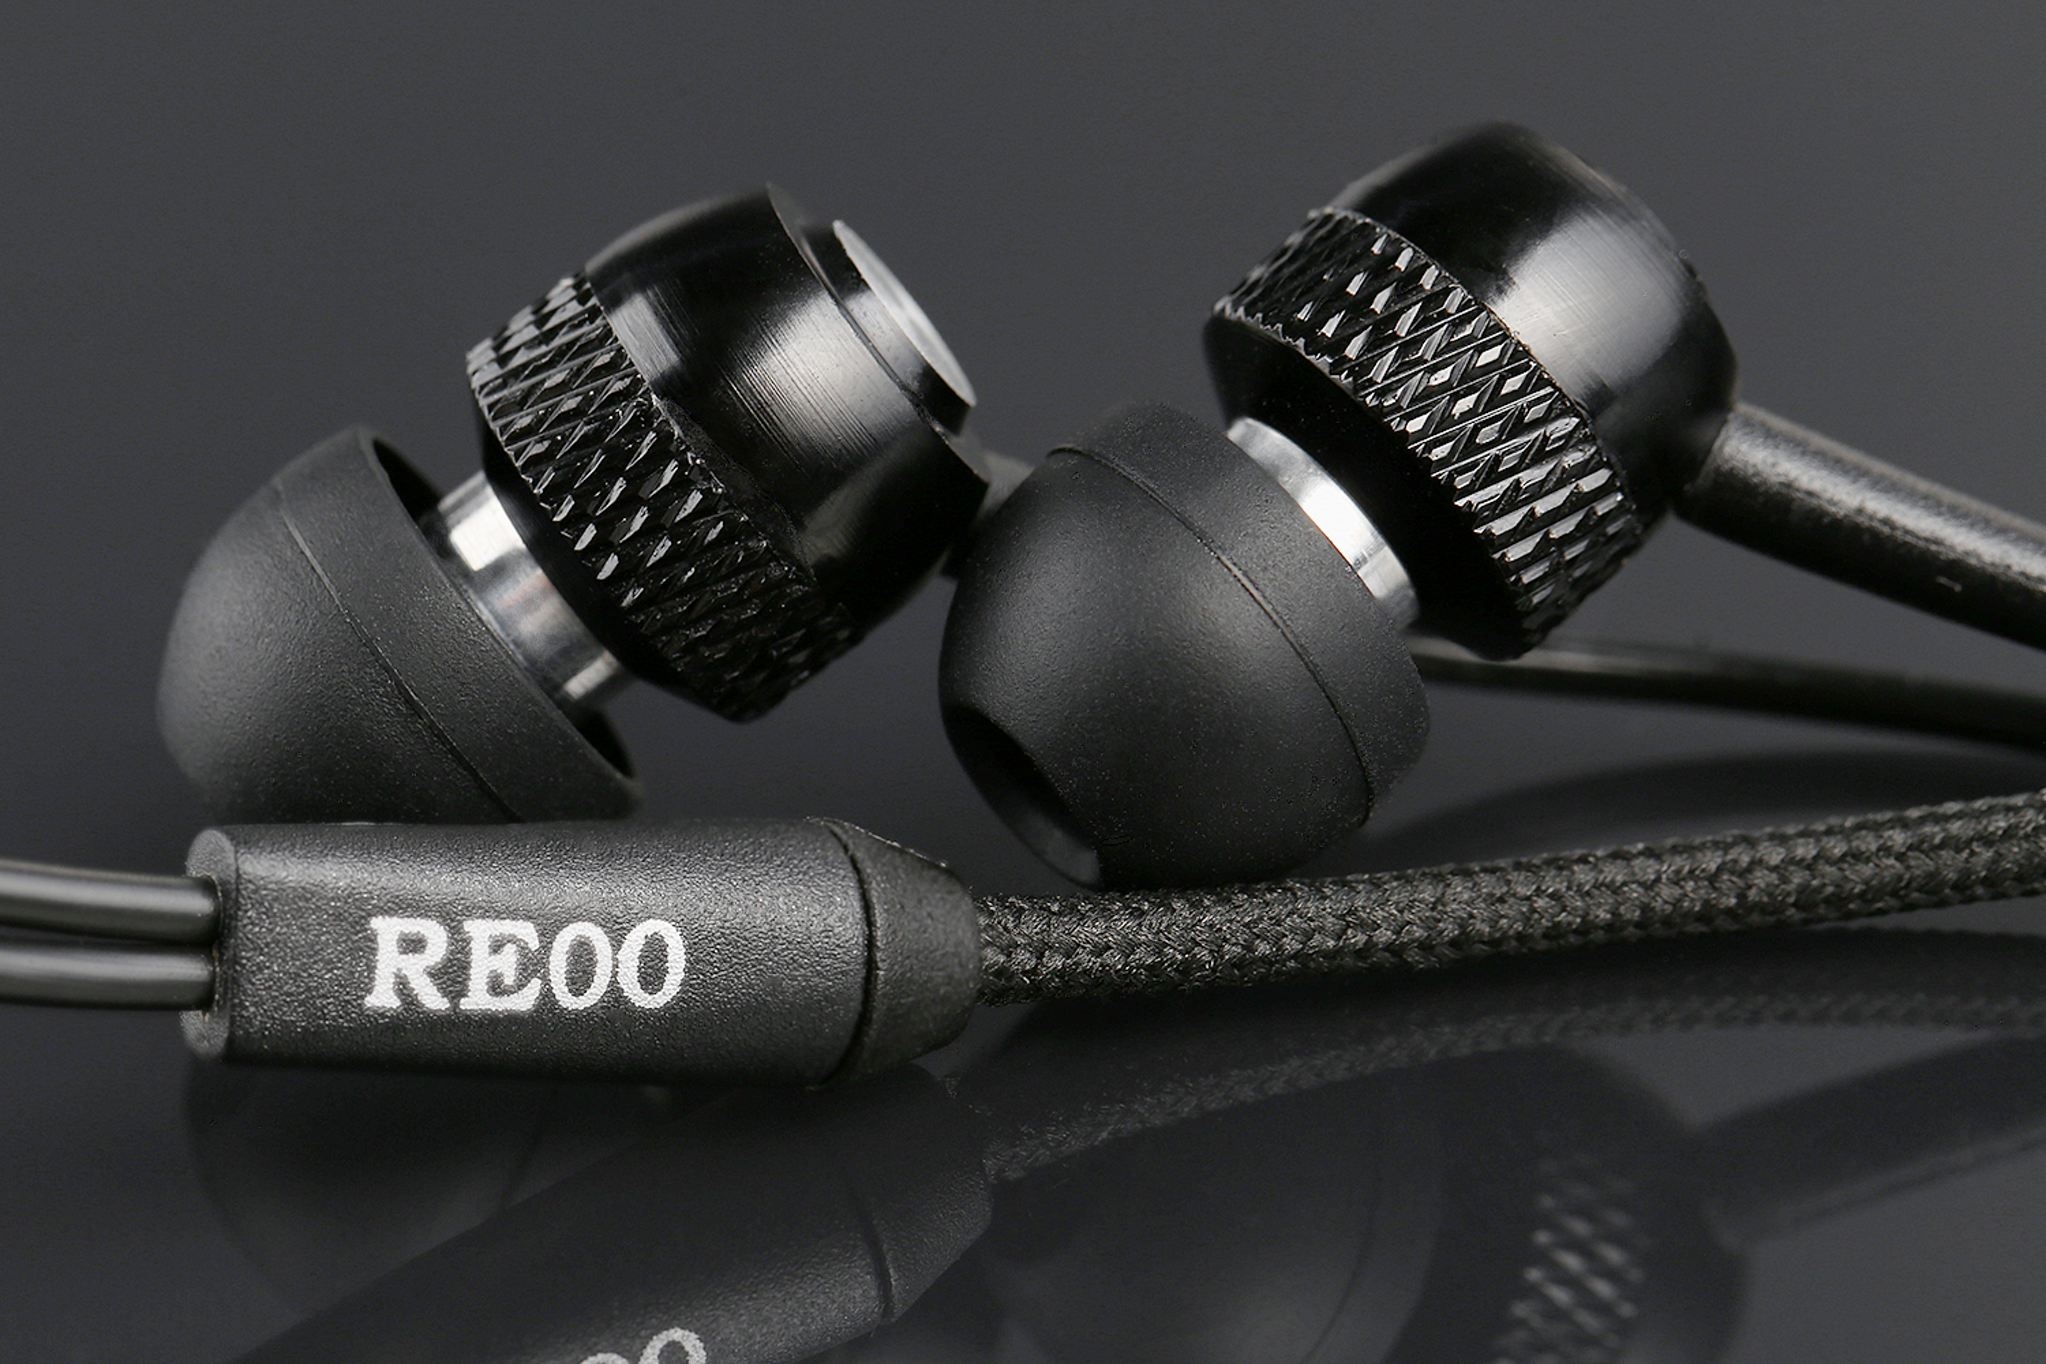 Hk Headphone Extream Bass E 15 Vol White Daftar Harga Terbaru Dan Steelseries Siberia P300 Ps4 Ps3 Mobile Pc Mac Hitam 804355014 Massdropxhifimanre00